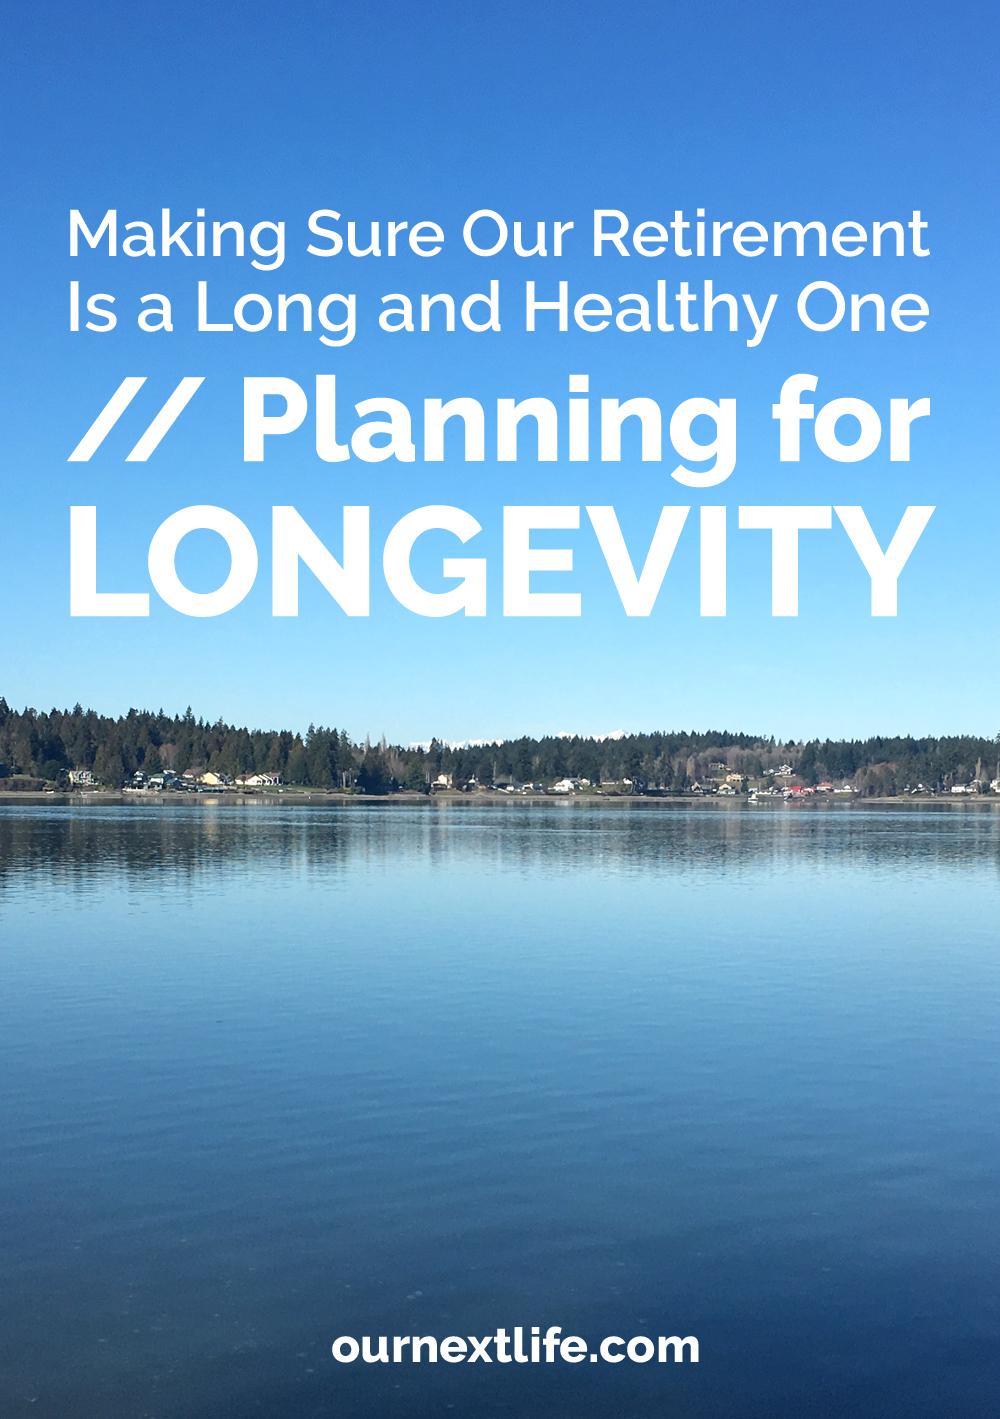 Planning for Good Health and Longevity in Retirement // longevity, lifestyle design, good health